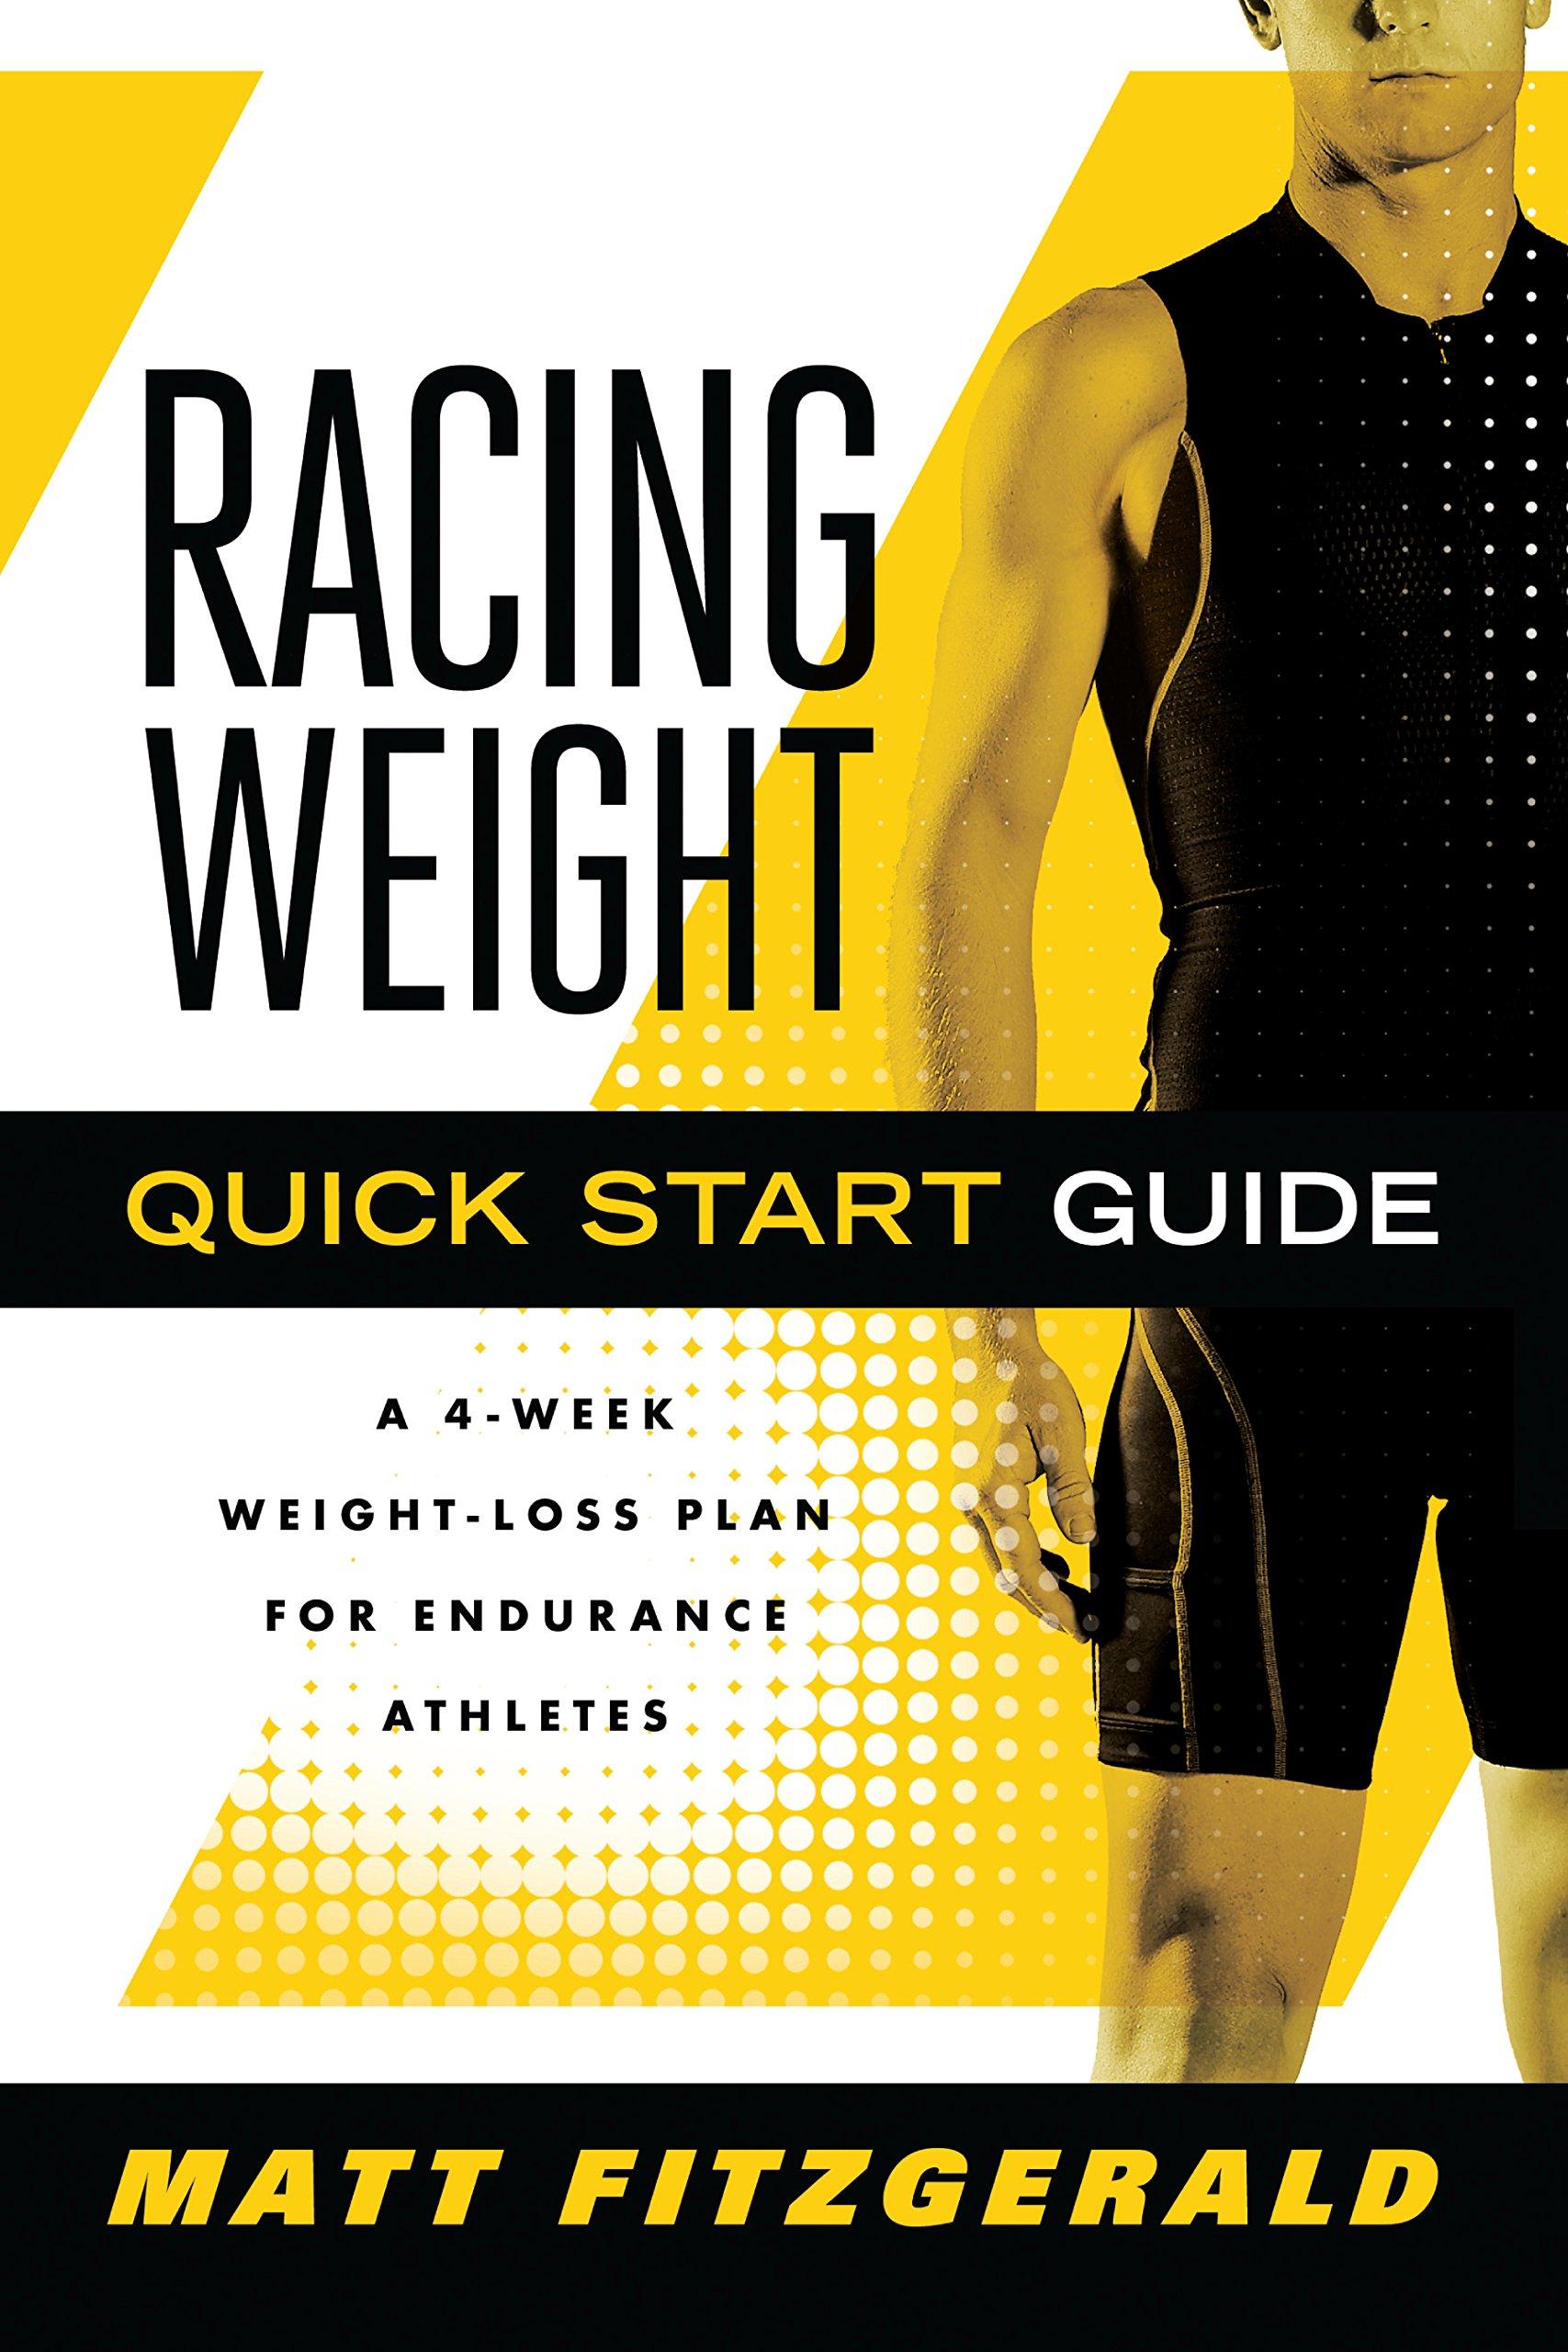 racing weight quick start guide a 4 week weight loss plan for rh amazon com Quick Start Guide Template Windows 8 Quick Start Guide